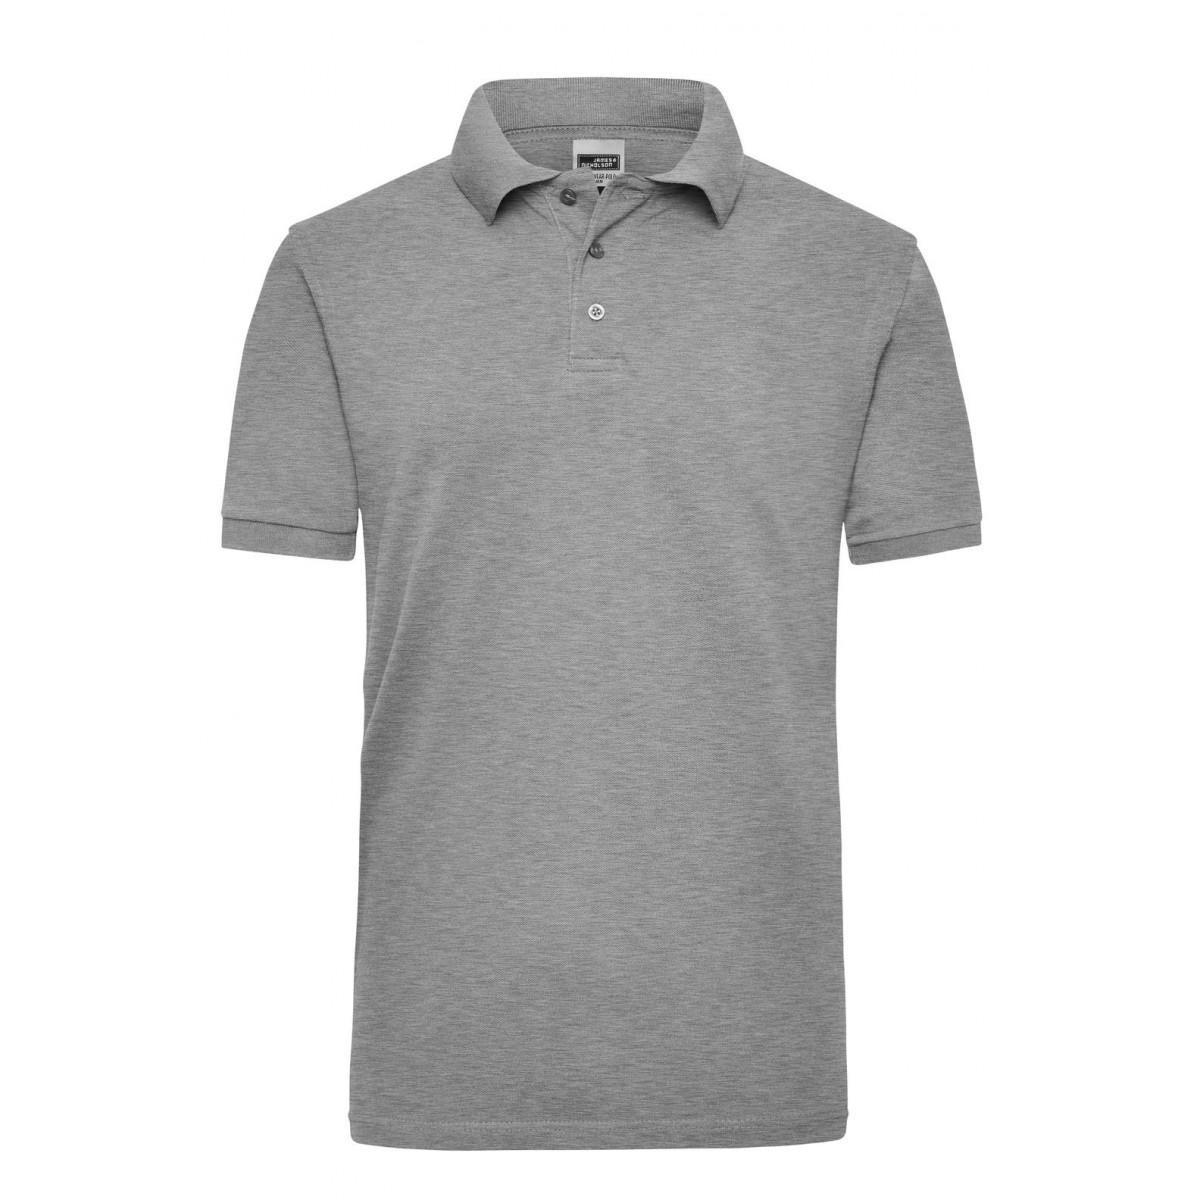 Рубашка поло мужская JN801 Workwear Polo Men - Серый меланж